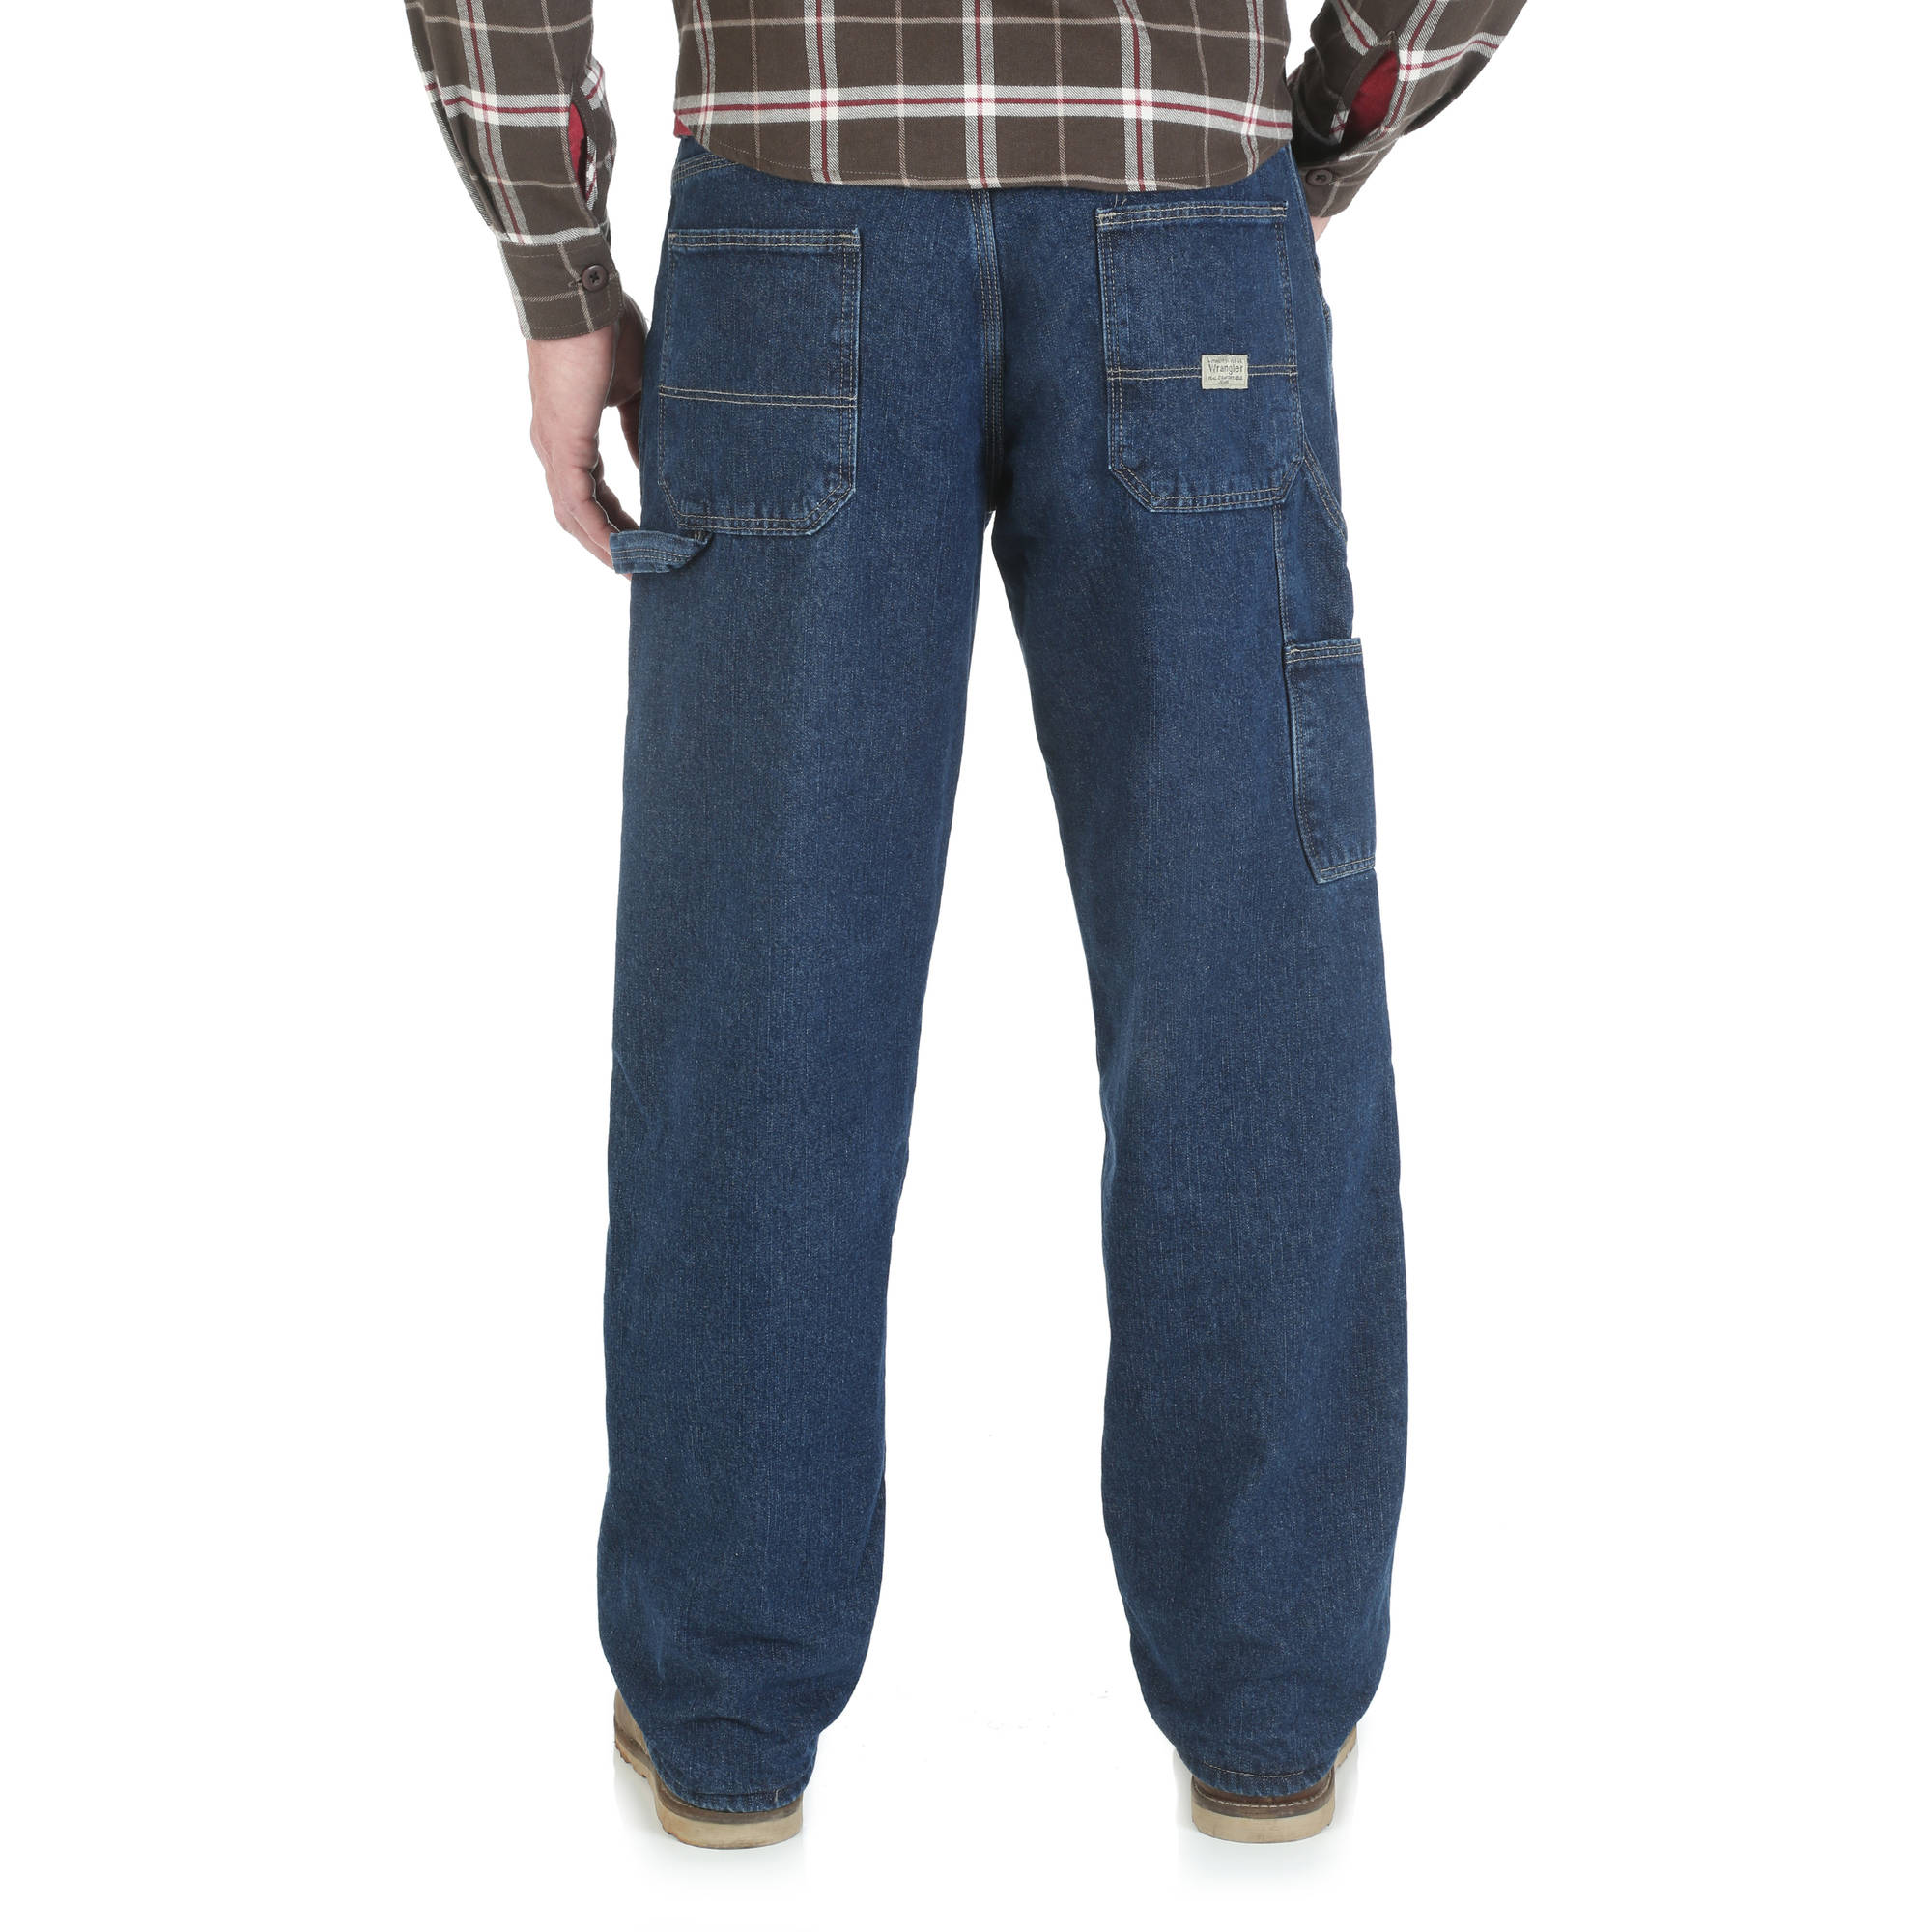 4e440a55 Wrangler - Men's Fleece Lined Carpenter Jean - Walmart.com